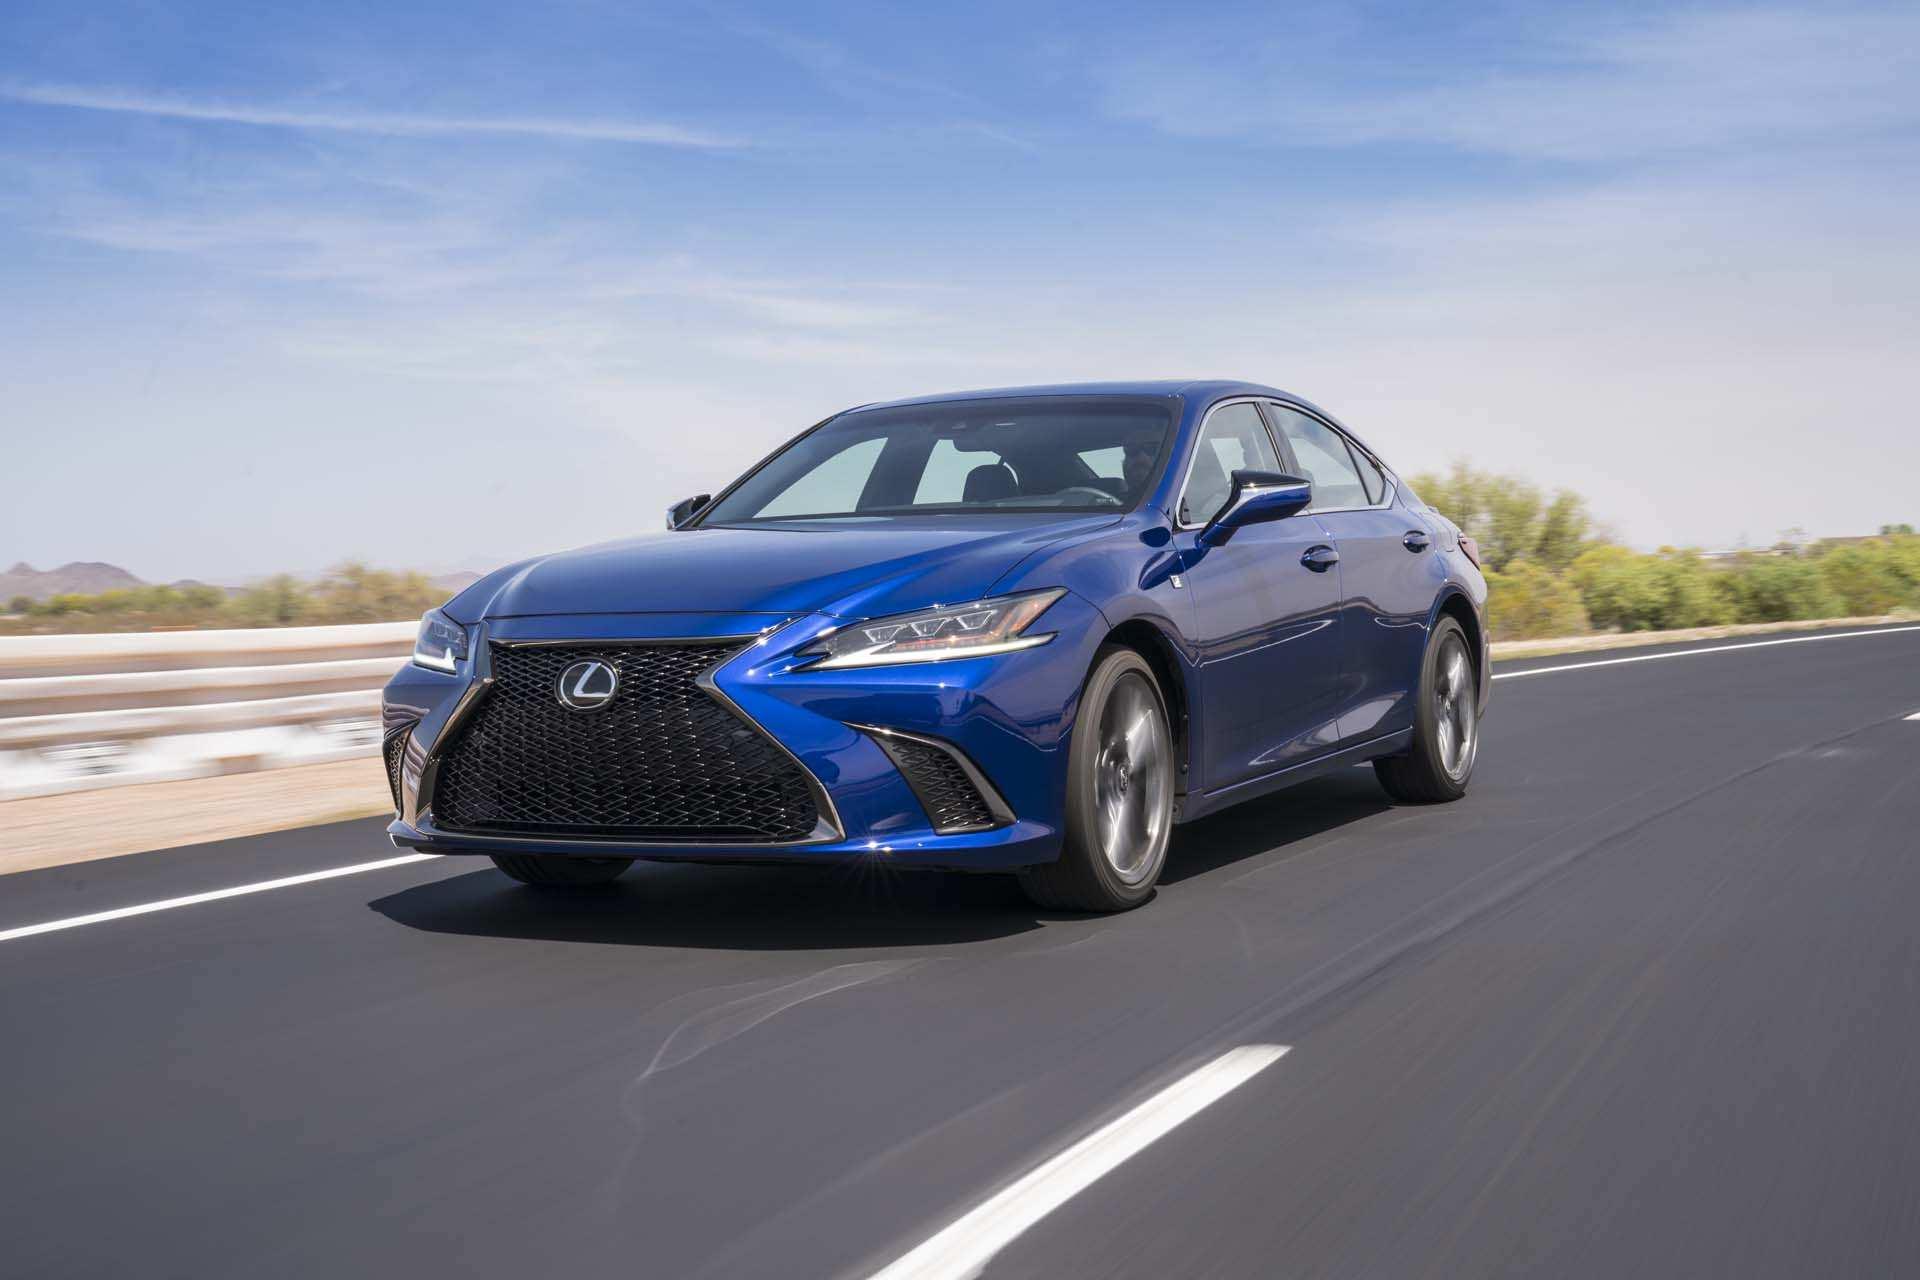 99 Great Lexus Gs 2019 Spesification with Lexus Gs 2019